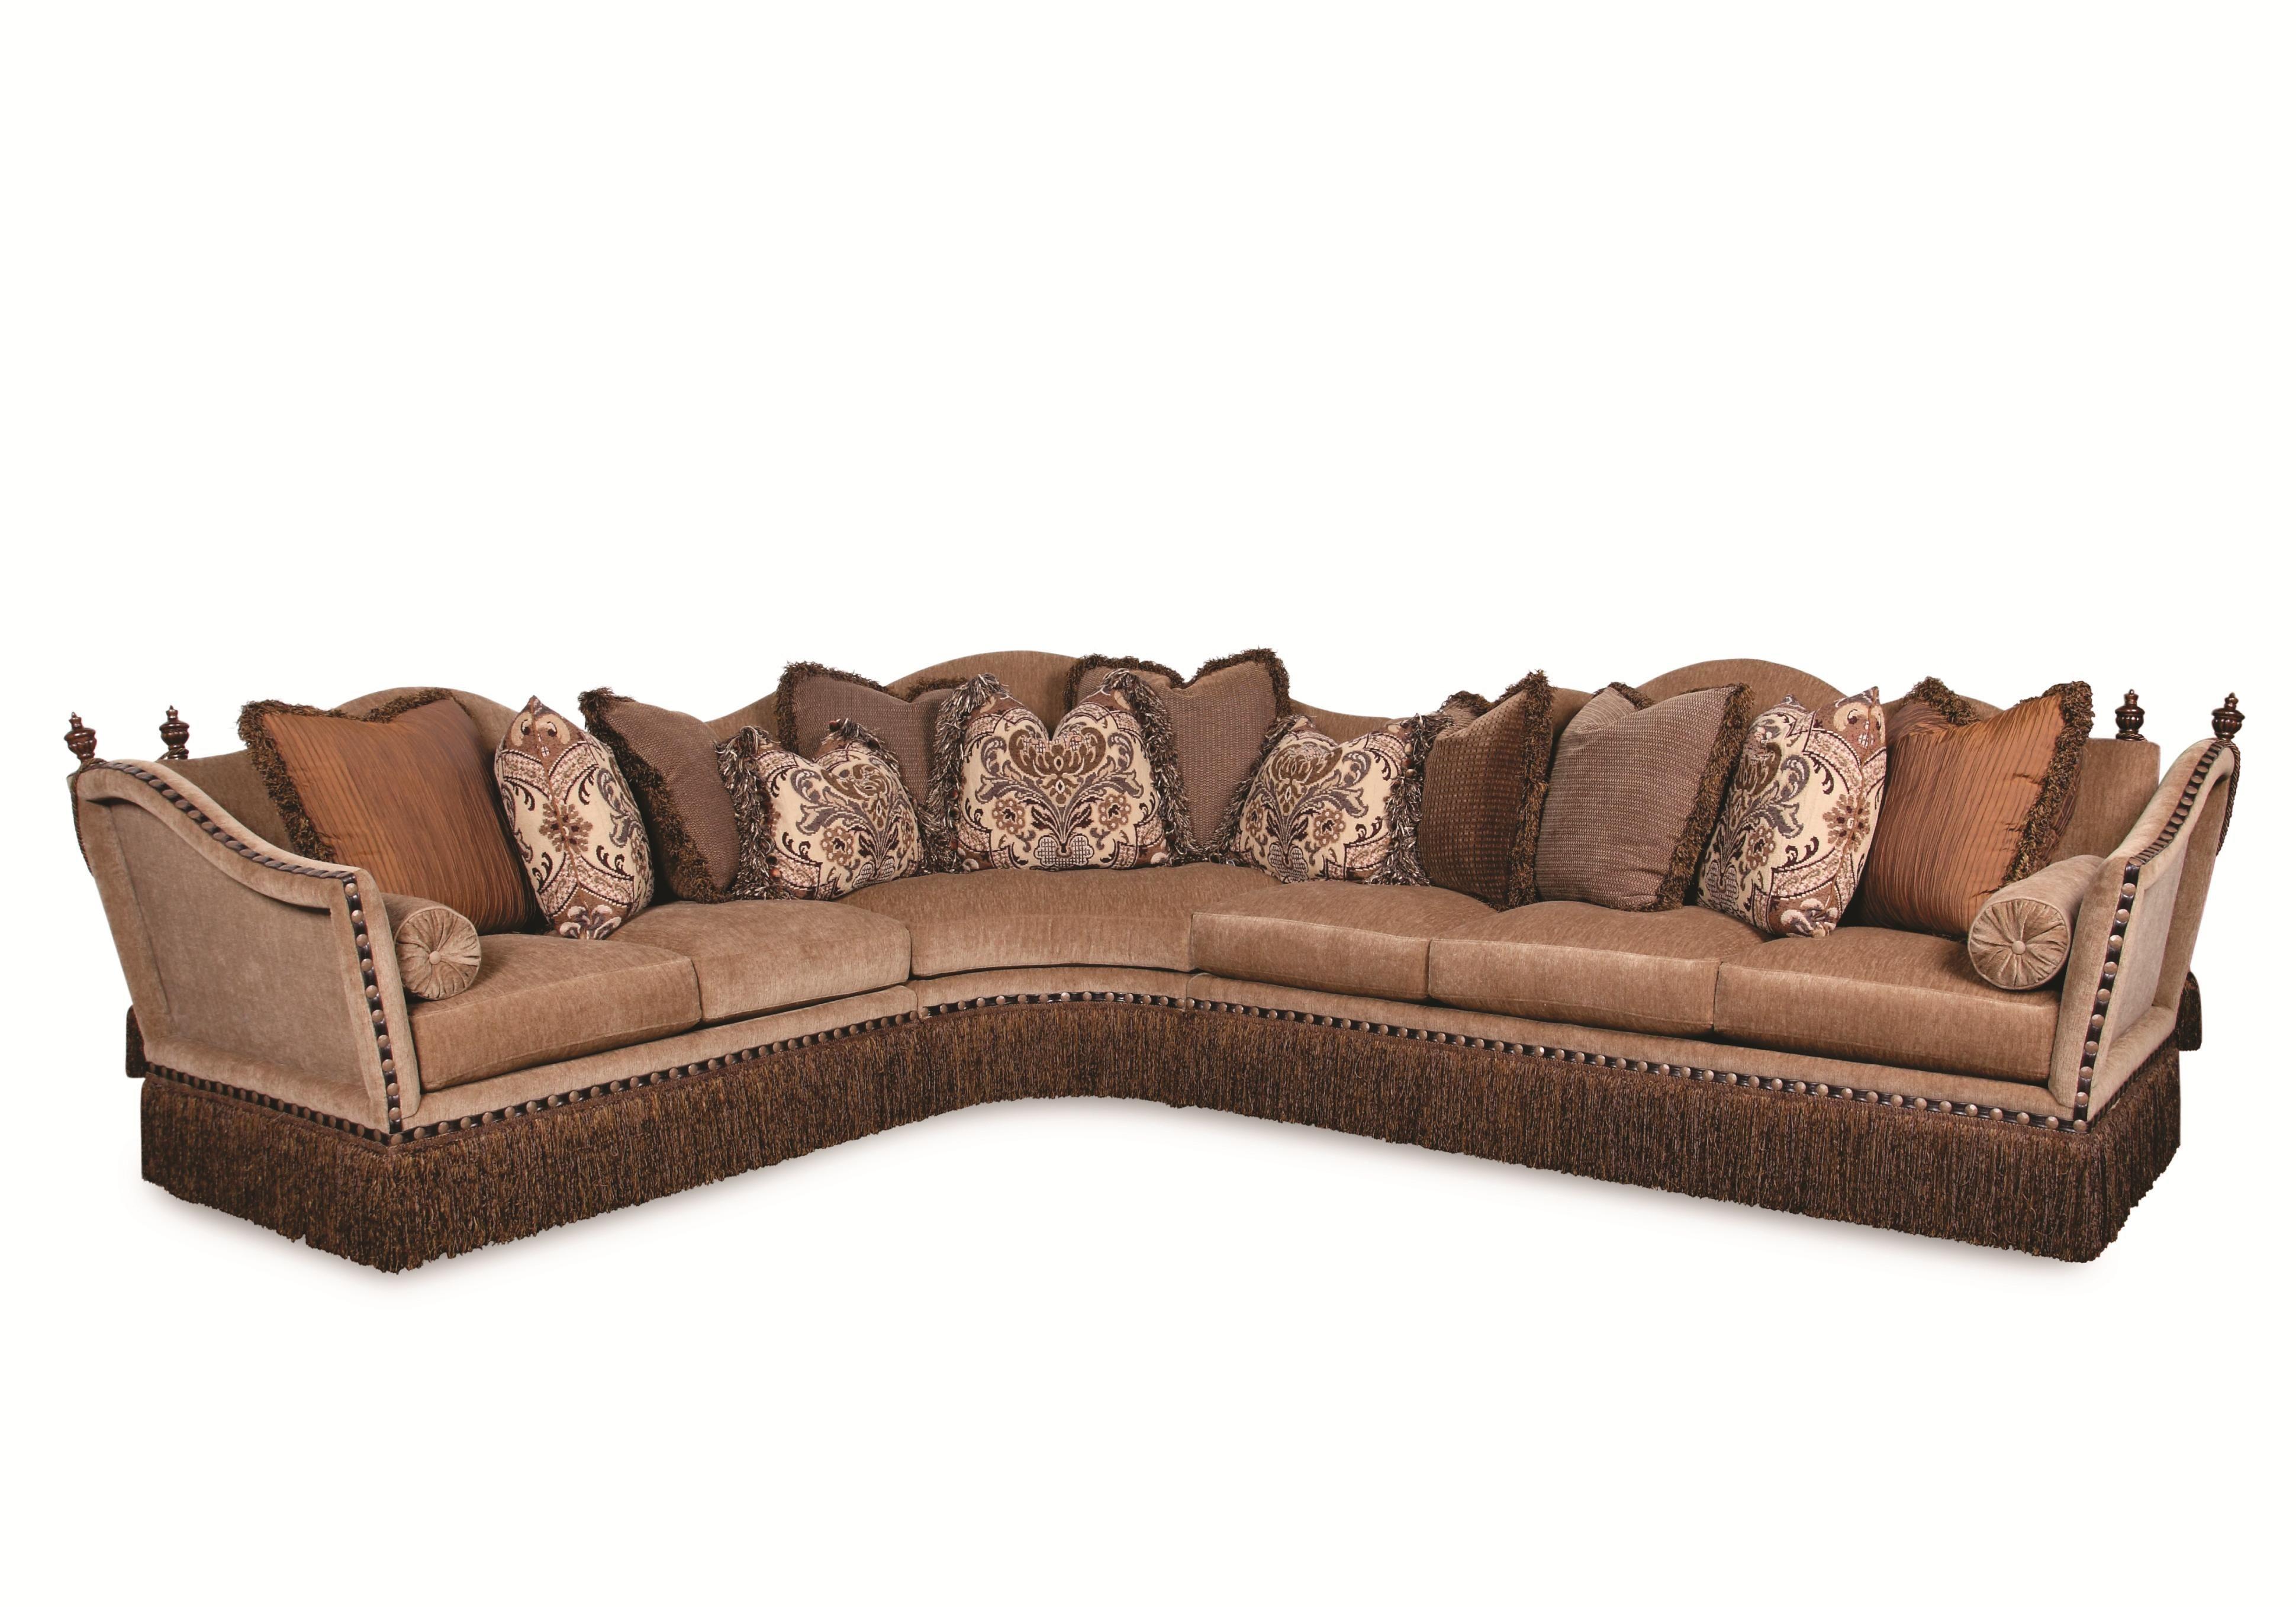 Howell Sofa Modular Systems Lorraine Fringed Sectional By Rachlin Classics Home